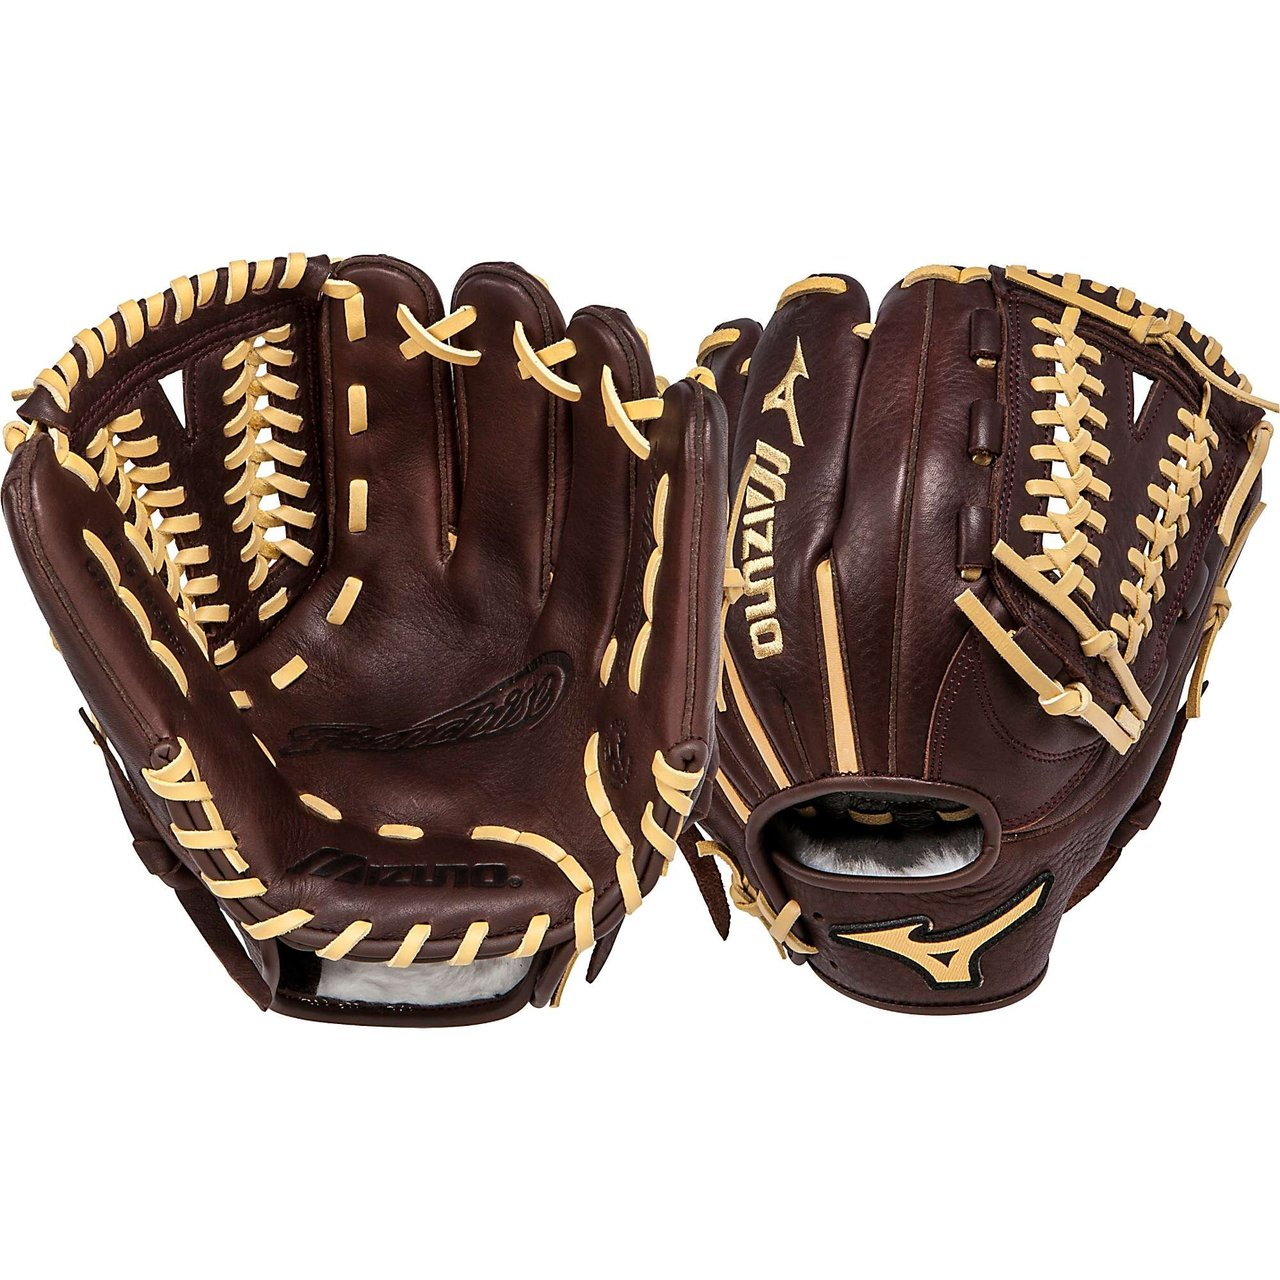 mizuno-franchise-series-gfn1151b1-baseball-glove-11-5-inch-right-handed-throw GFN1151B1-Right Handed Throw Mizuno New Mizuno Franchise Series GFN1151B1 Baseball Glove 11.5 inch Right Handed Throw